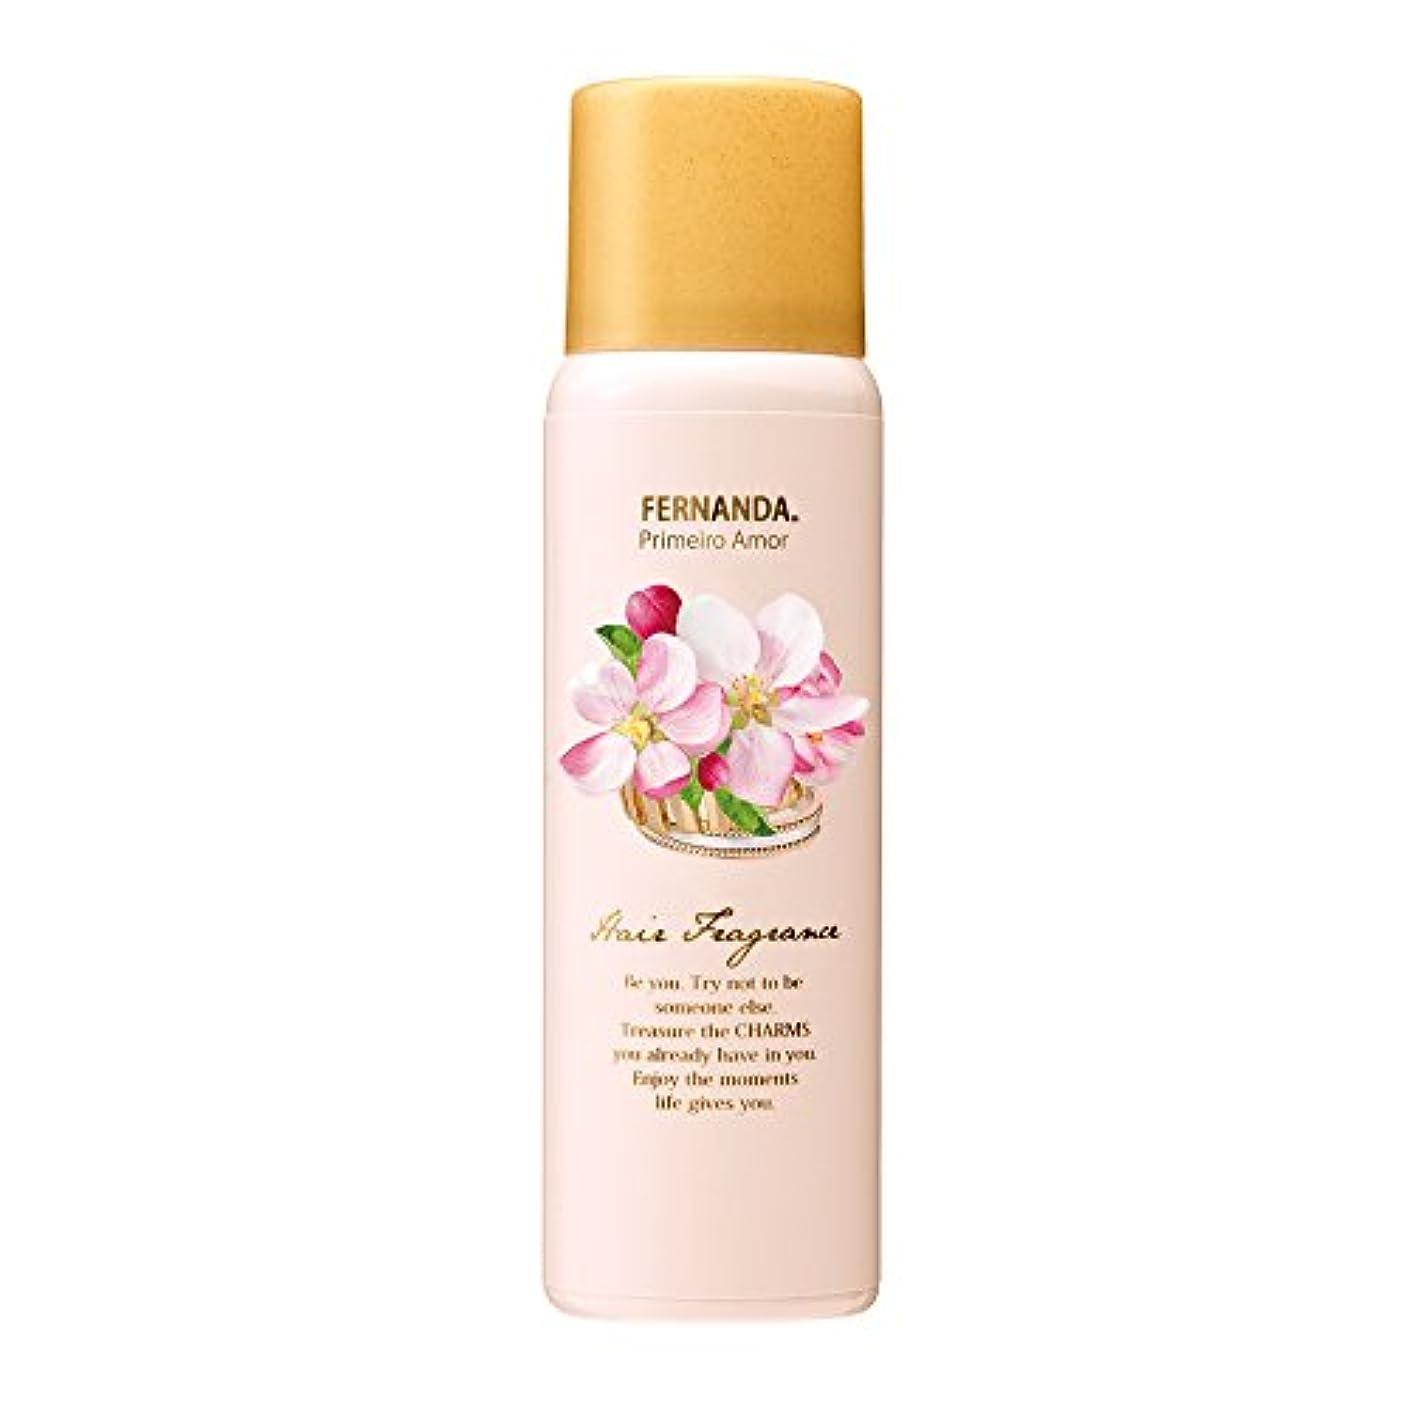 FERNANDA(フェルナンダ) Hair Fragrance Primeiro Amor (ヘアフレグランス プリメイロアモール)